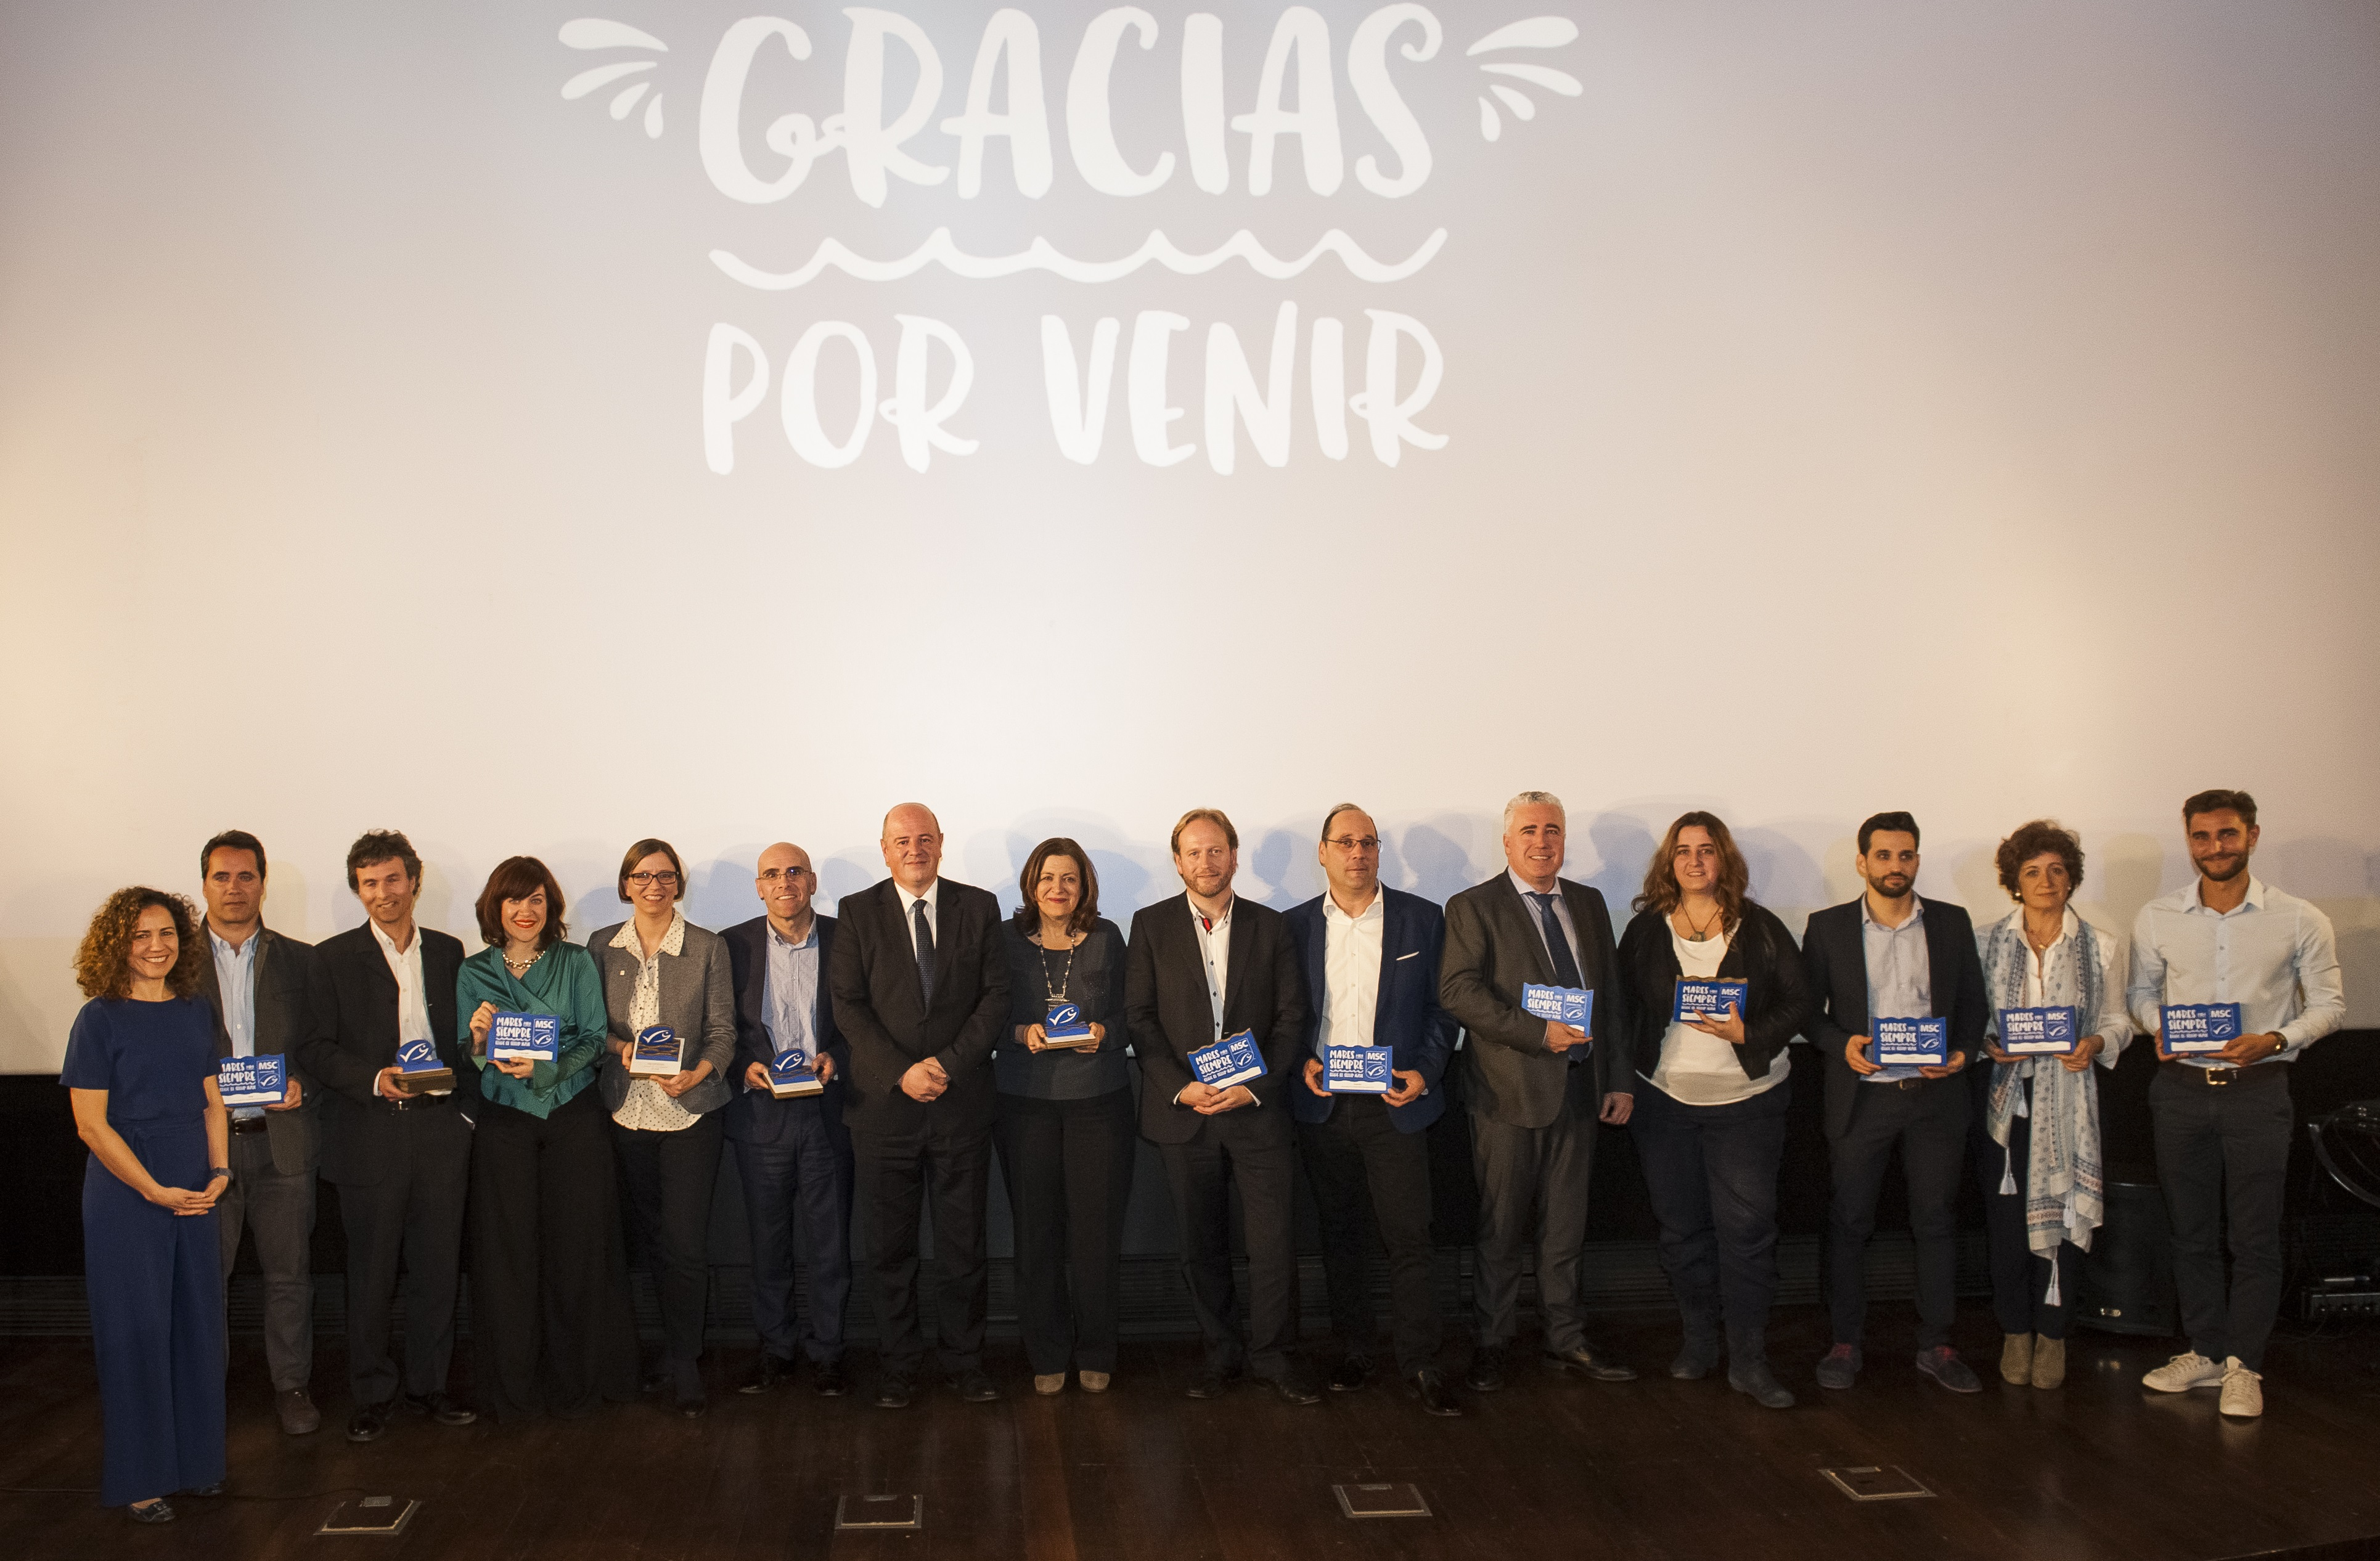 Premios_MaresParaSiempre_Oroz4.jpg